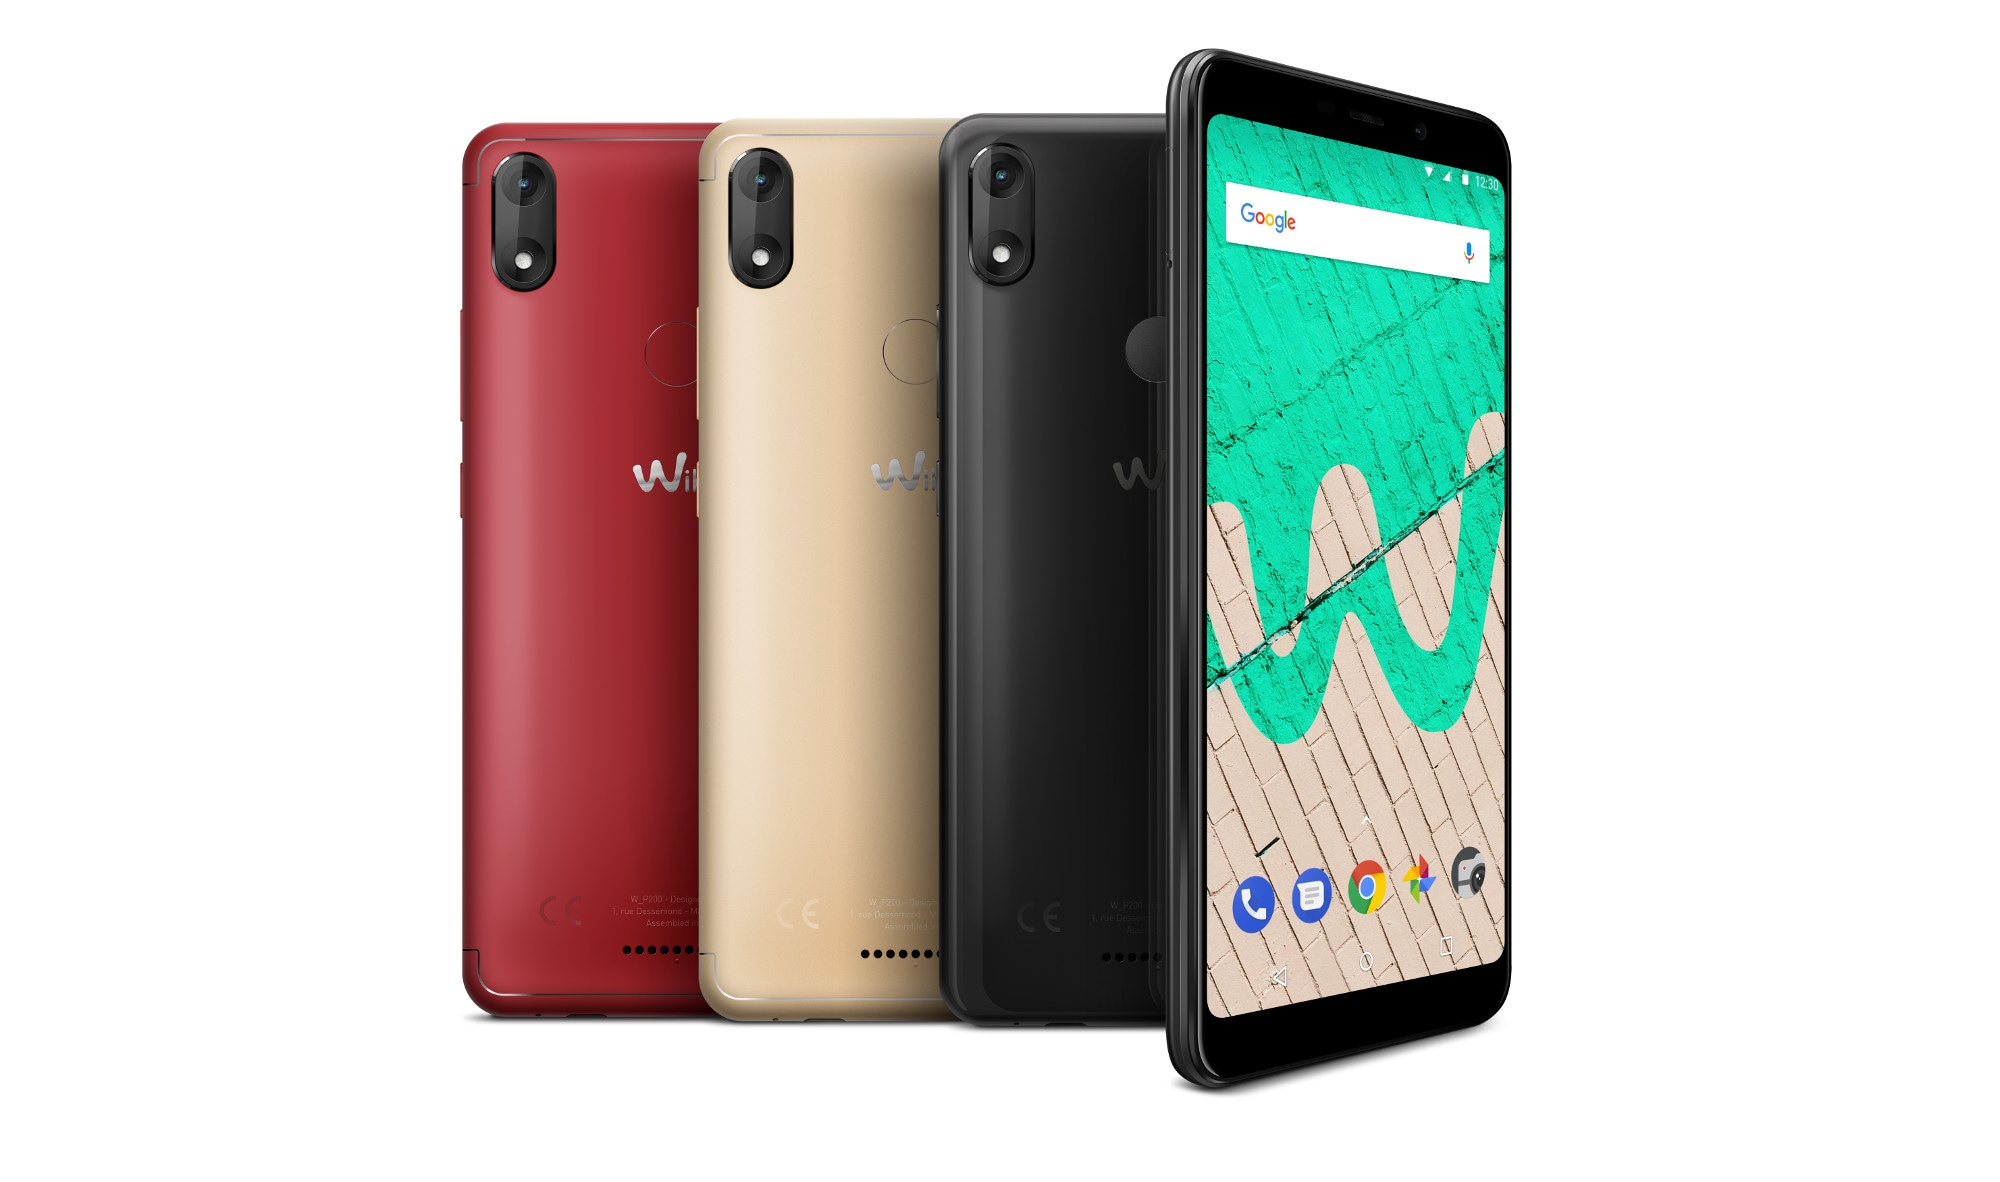 WIko_View-Max_Compo-All-Colors